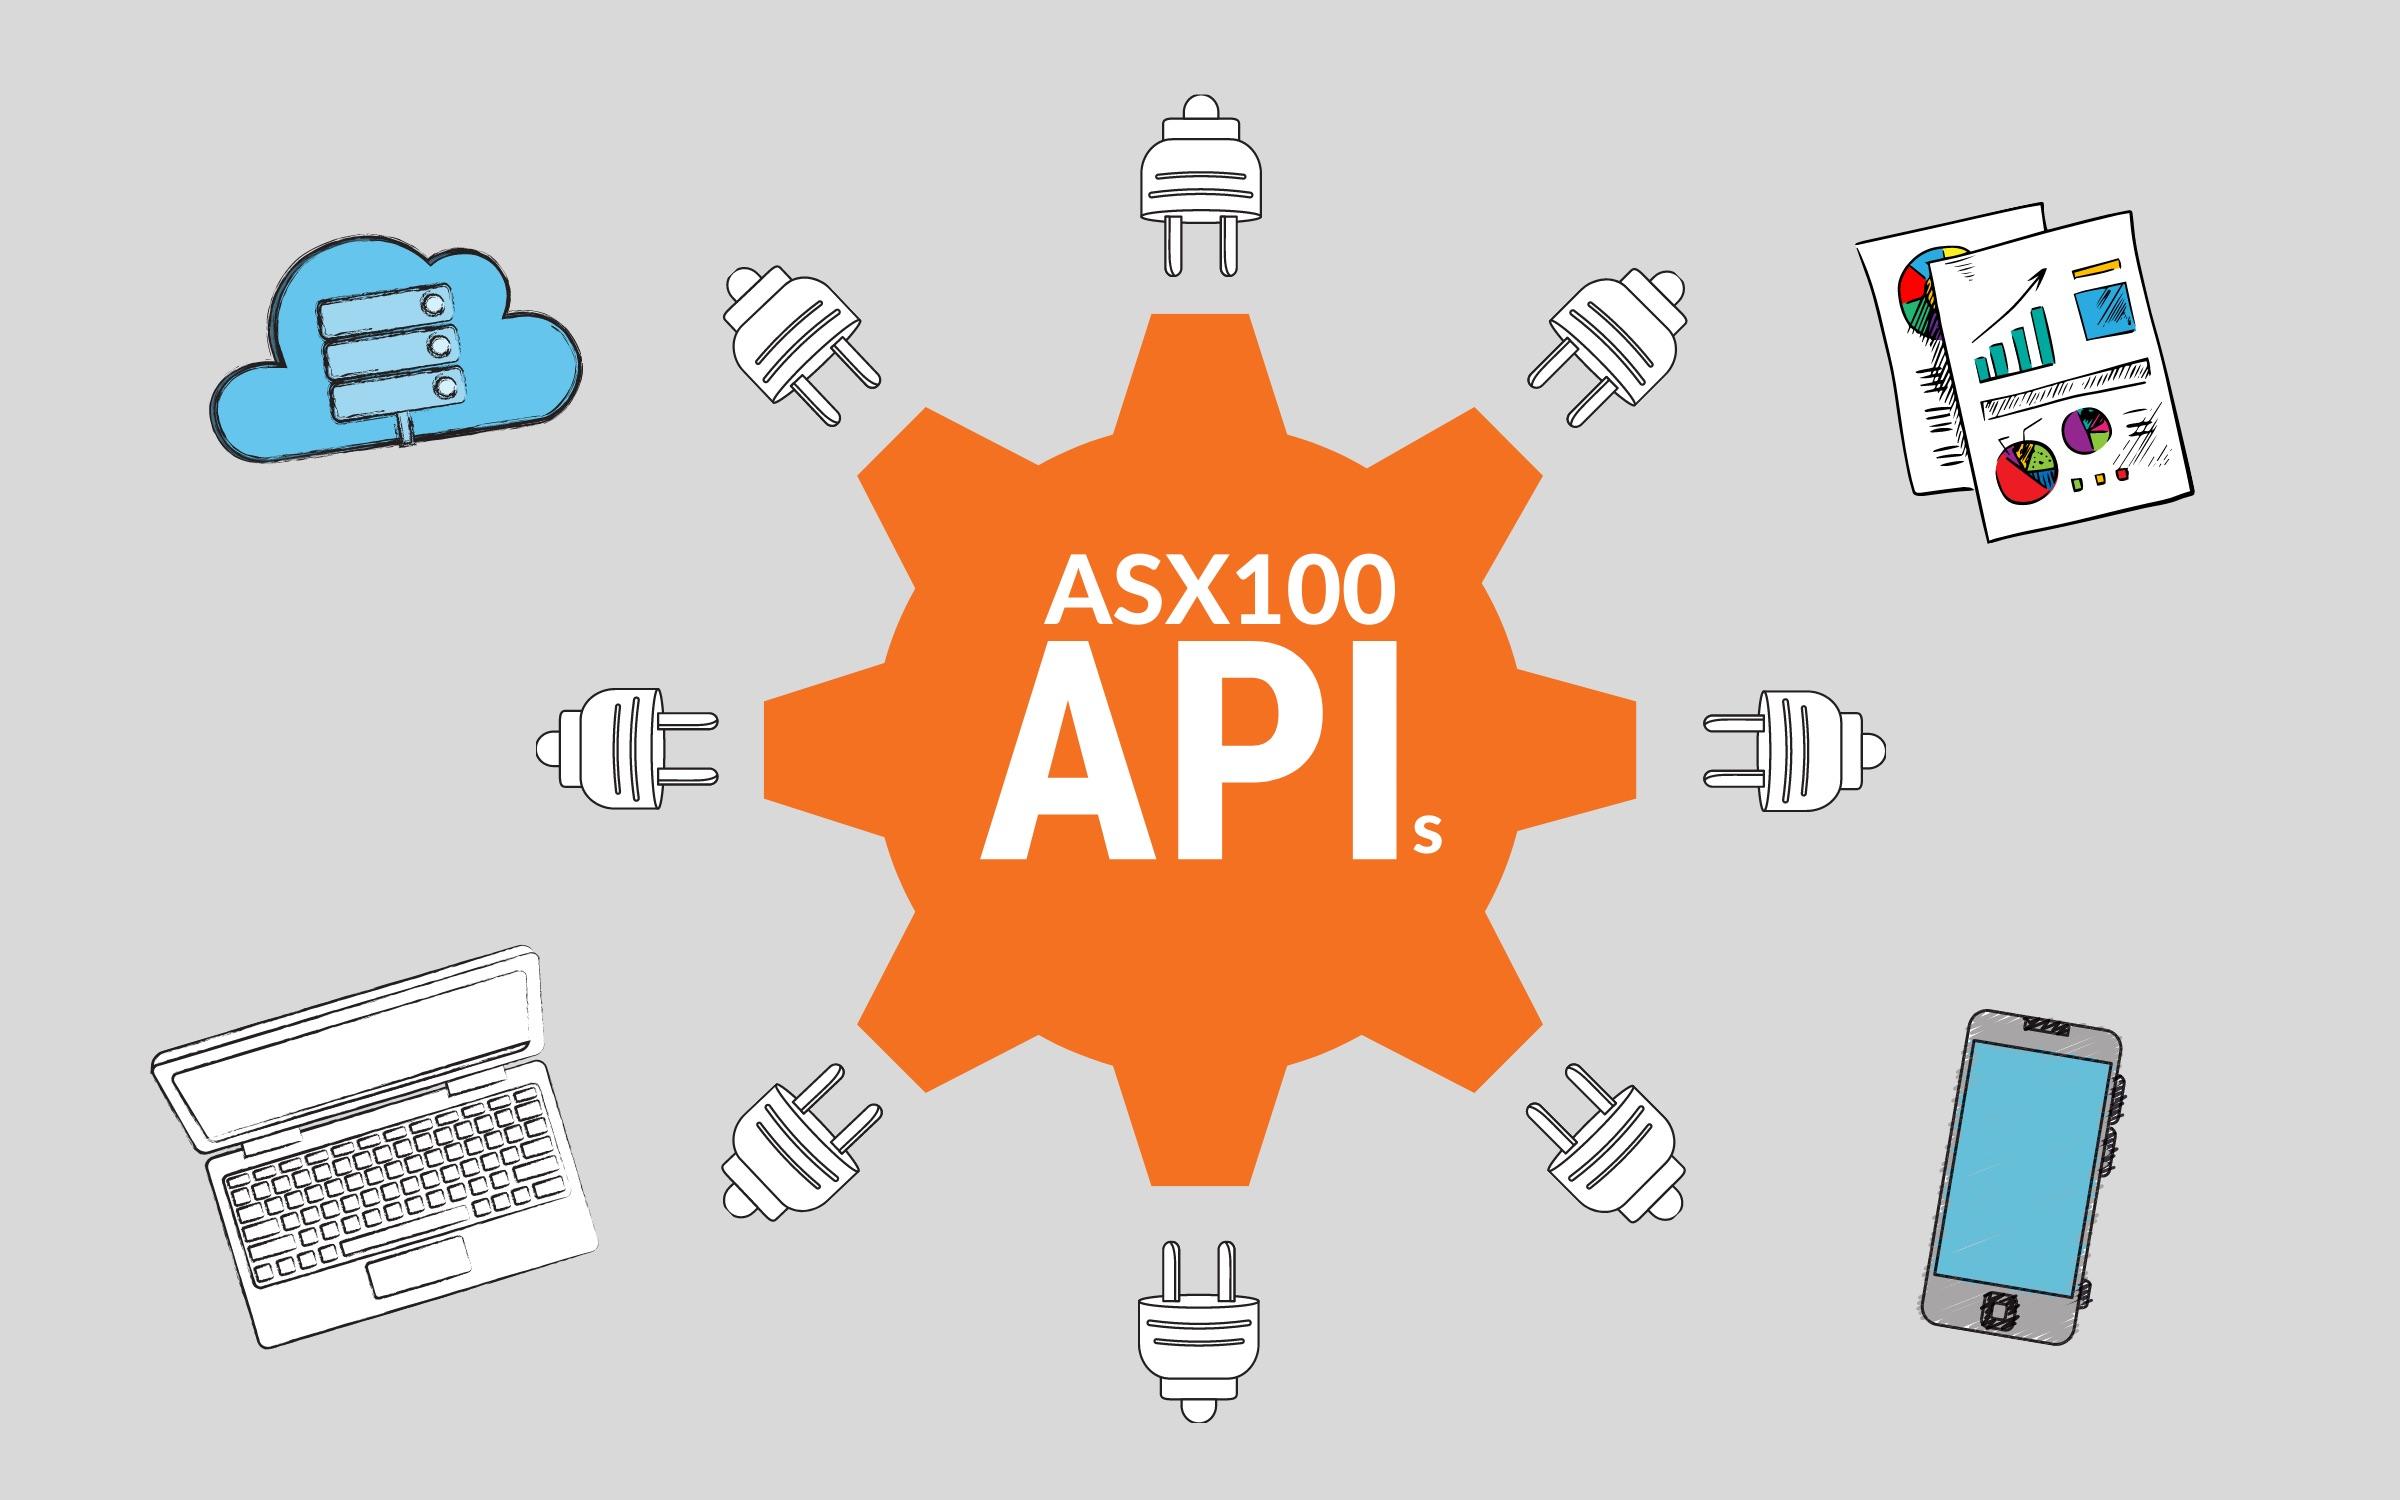 Public ASX100 APIs: The Essential List